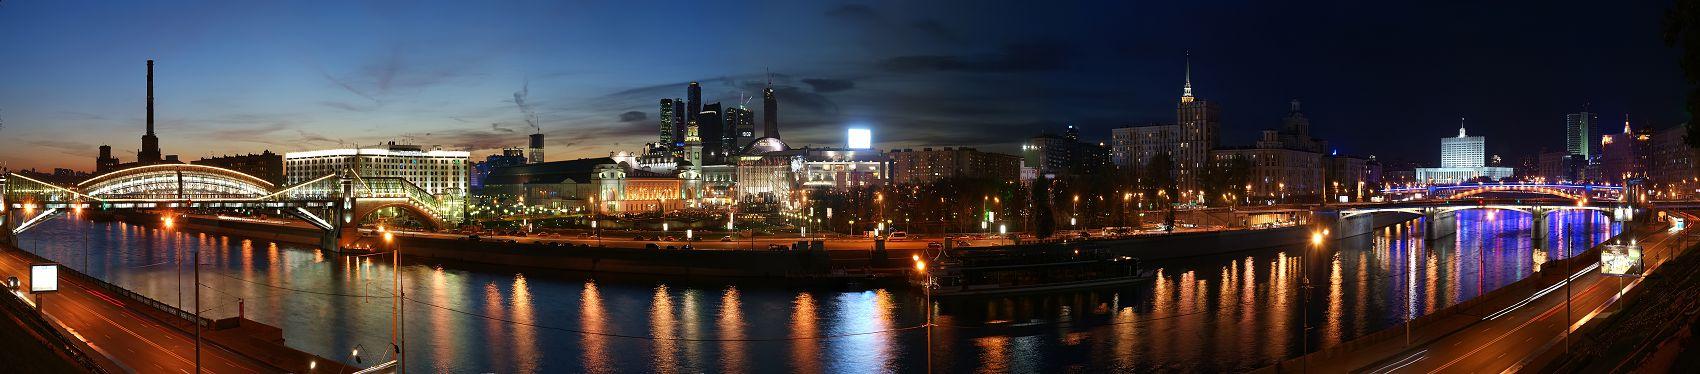 Москва река ночью